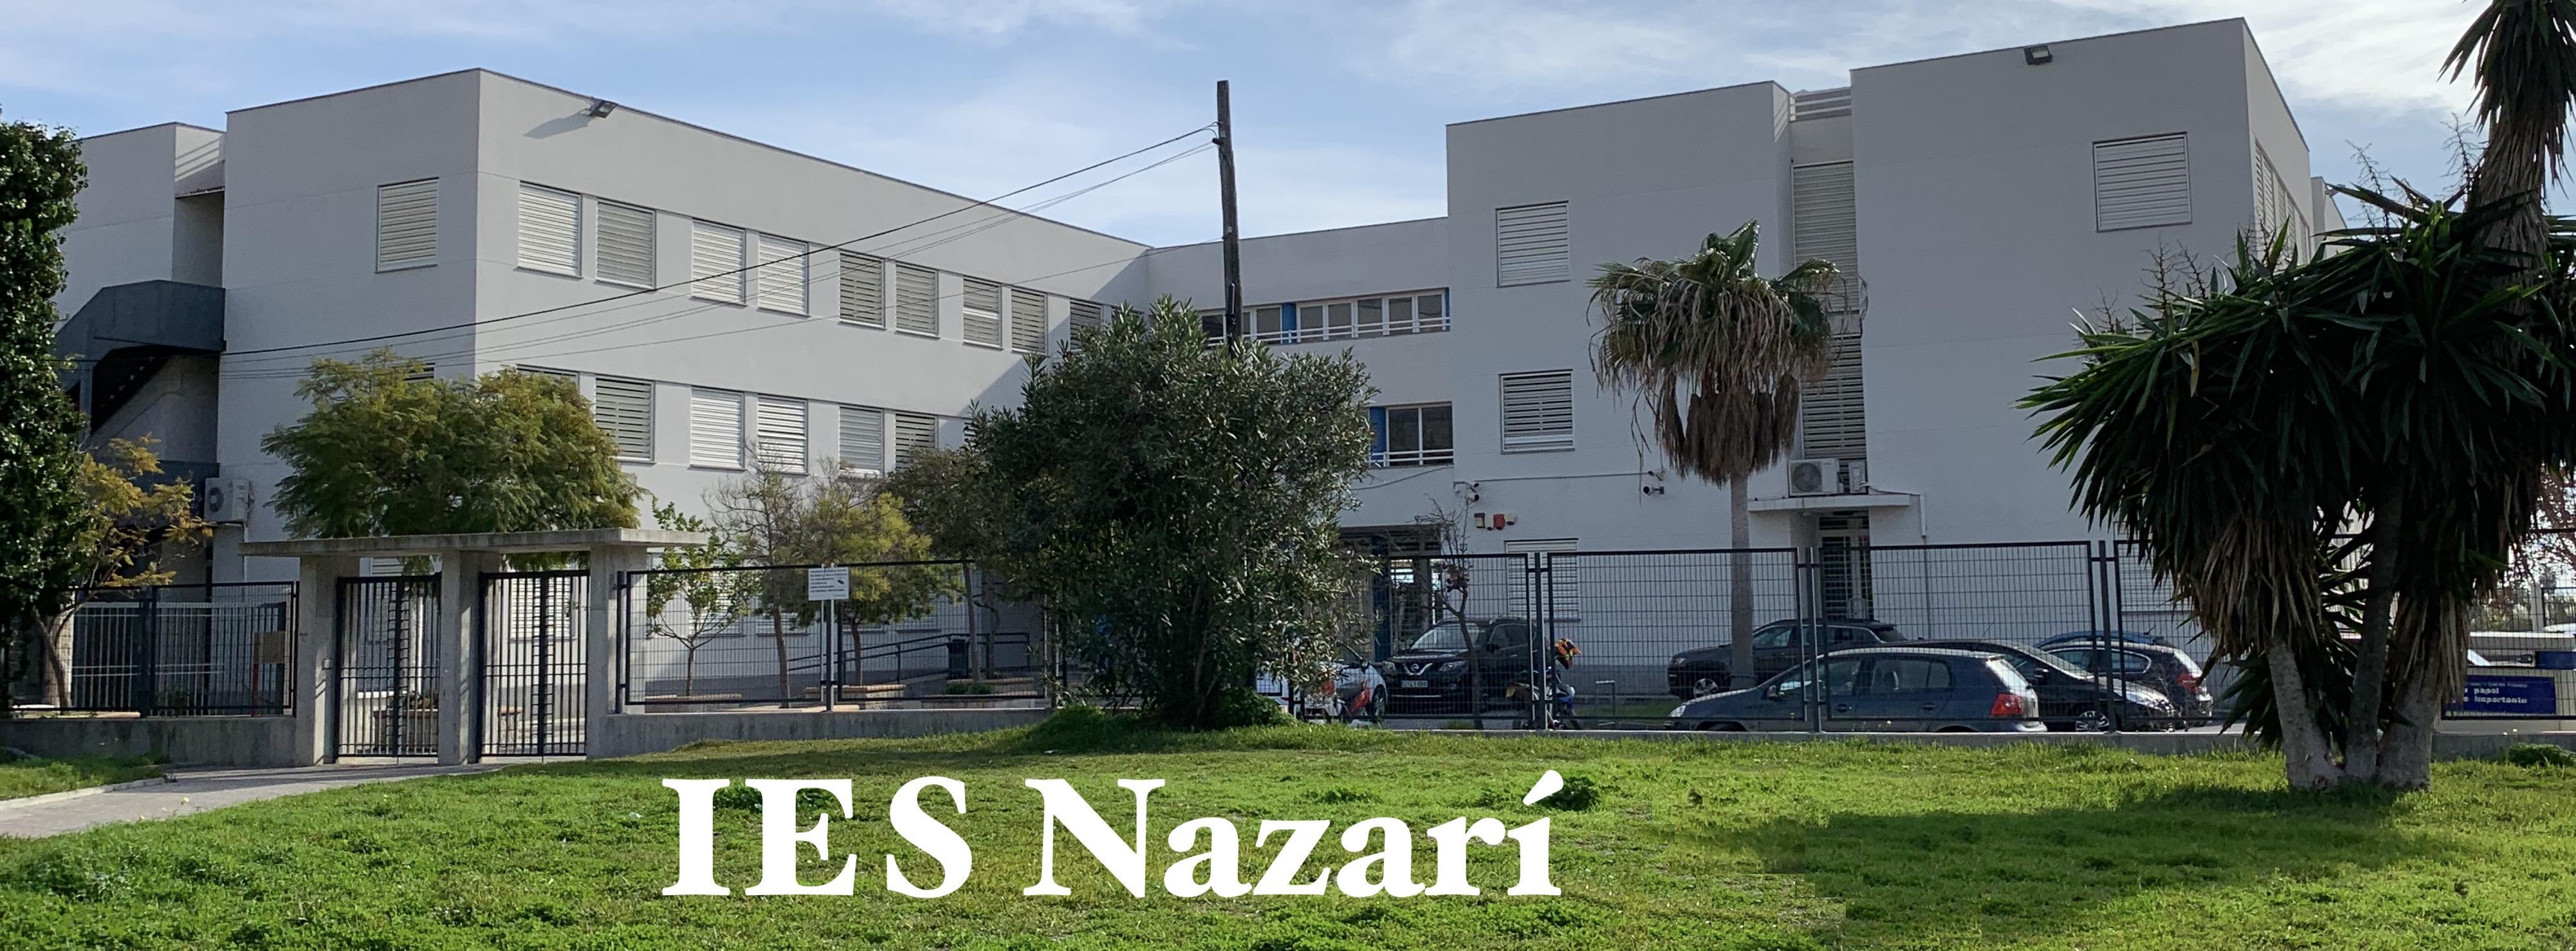 IES Nazarí